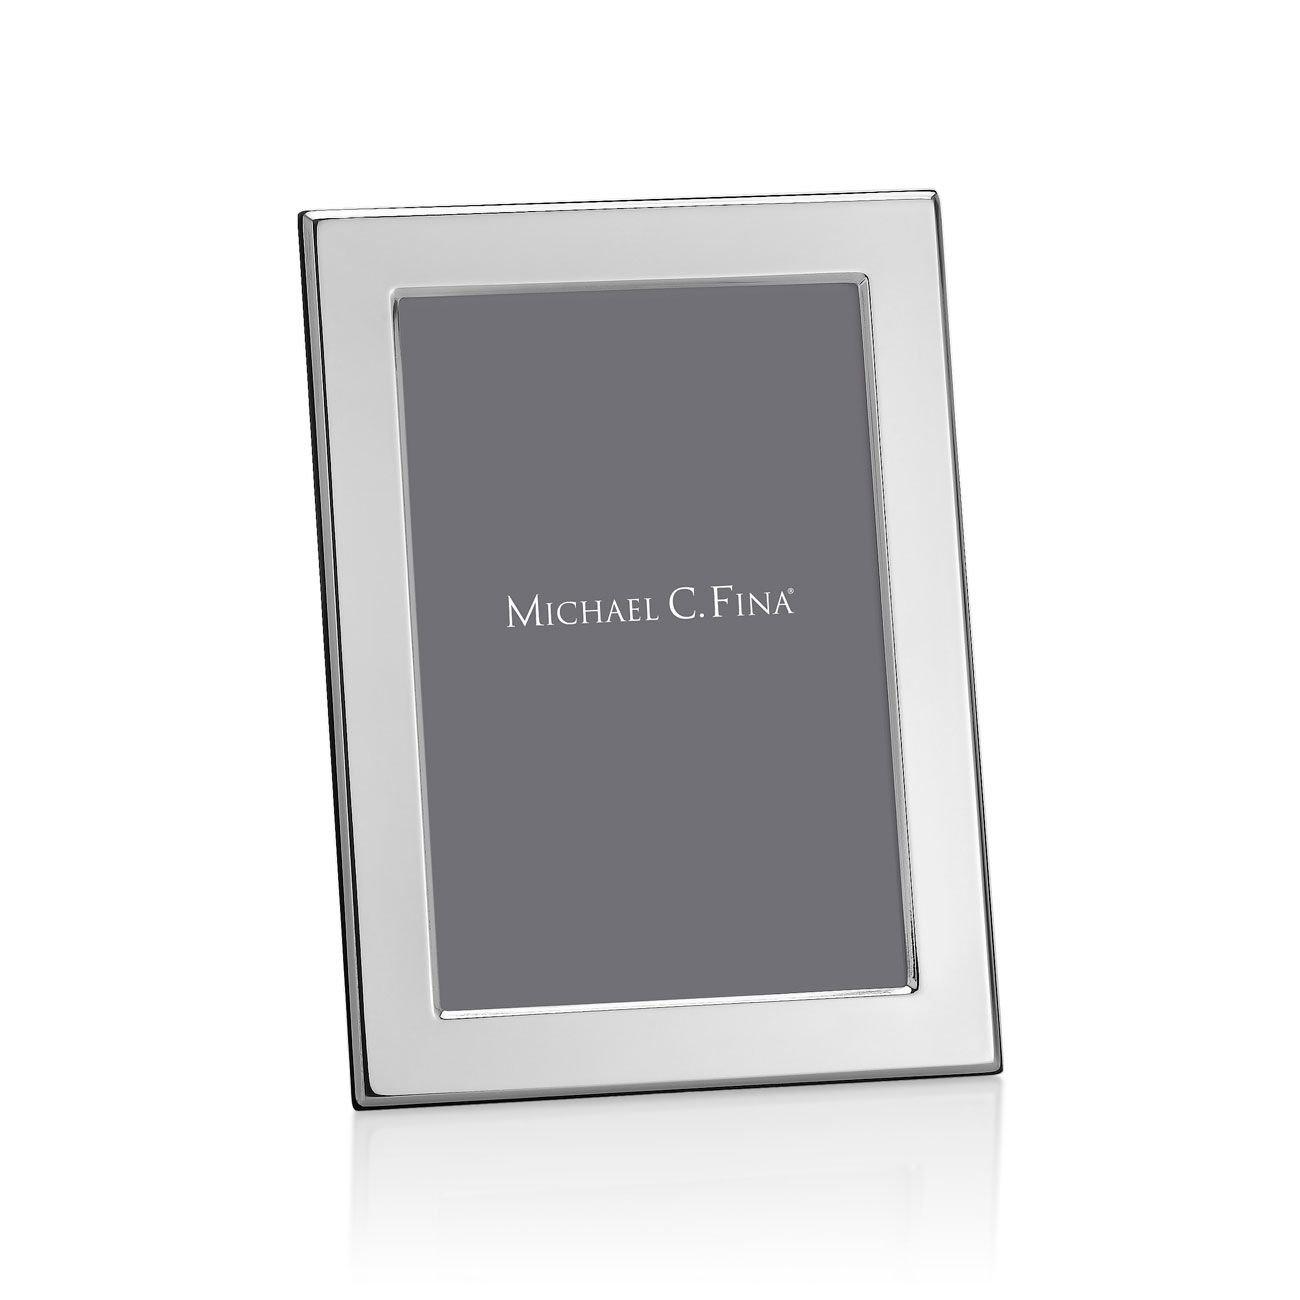 Michael C. Fina Greenwich Frame, Sterling Silver, 4-Inch-By-6-Inch